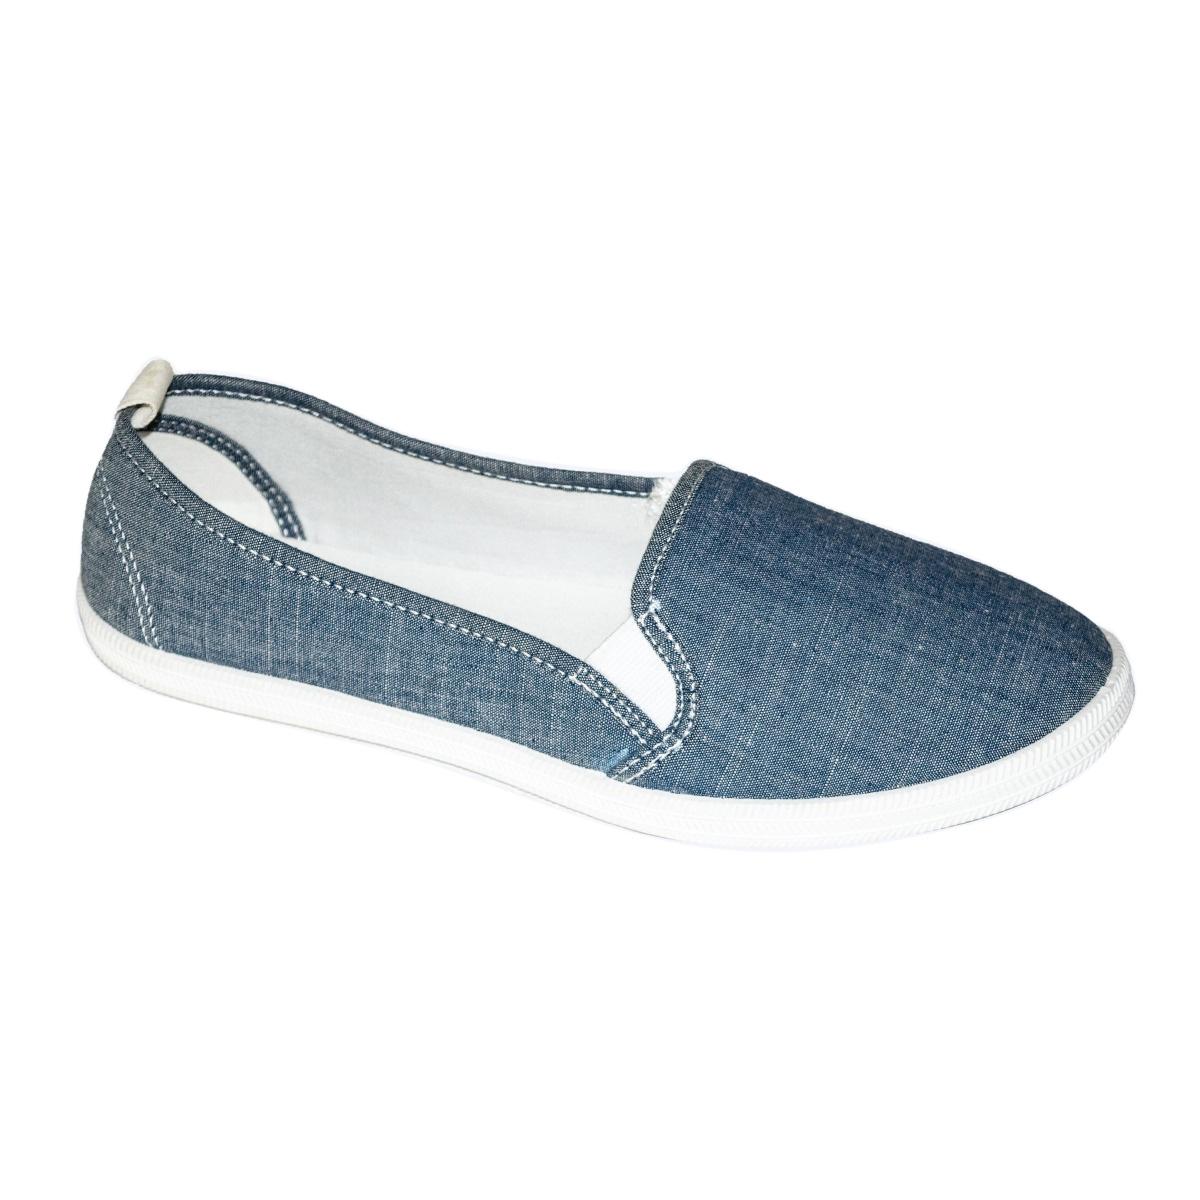 Orion Footwear Bangladesh Online Shop